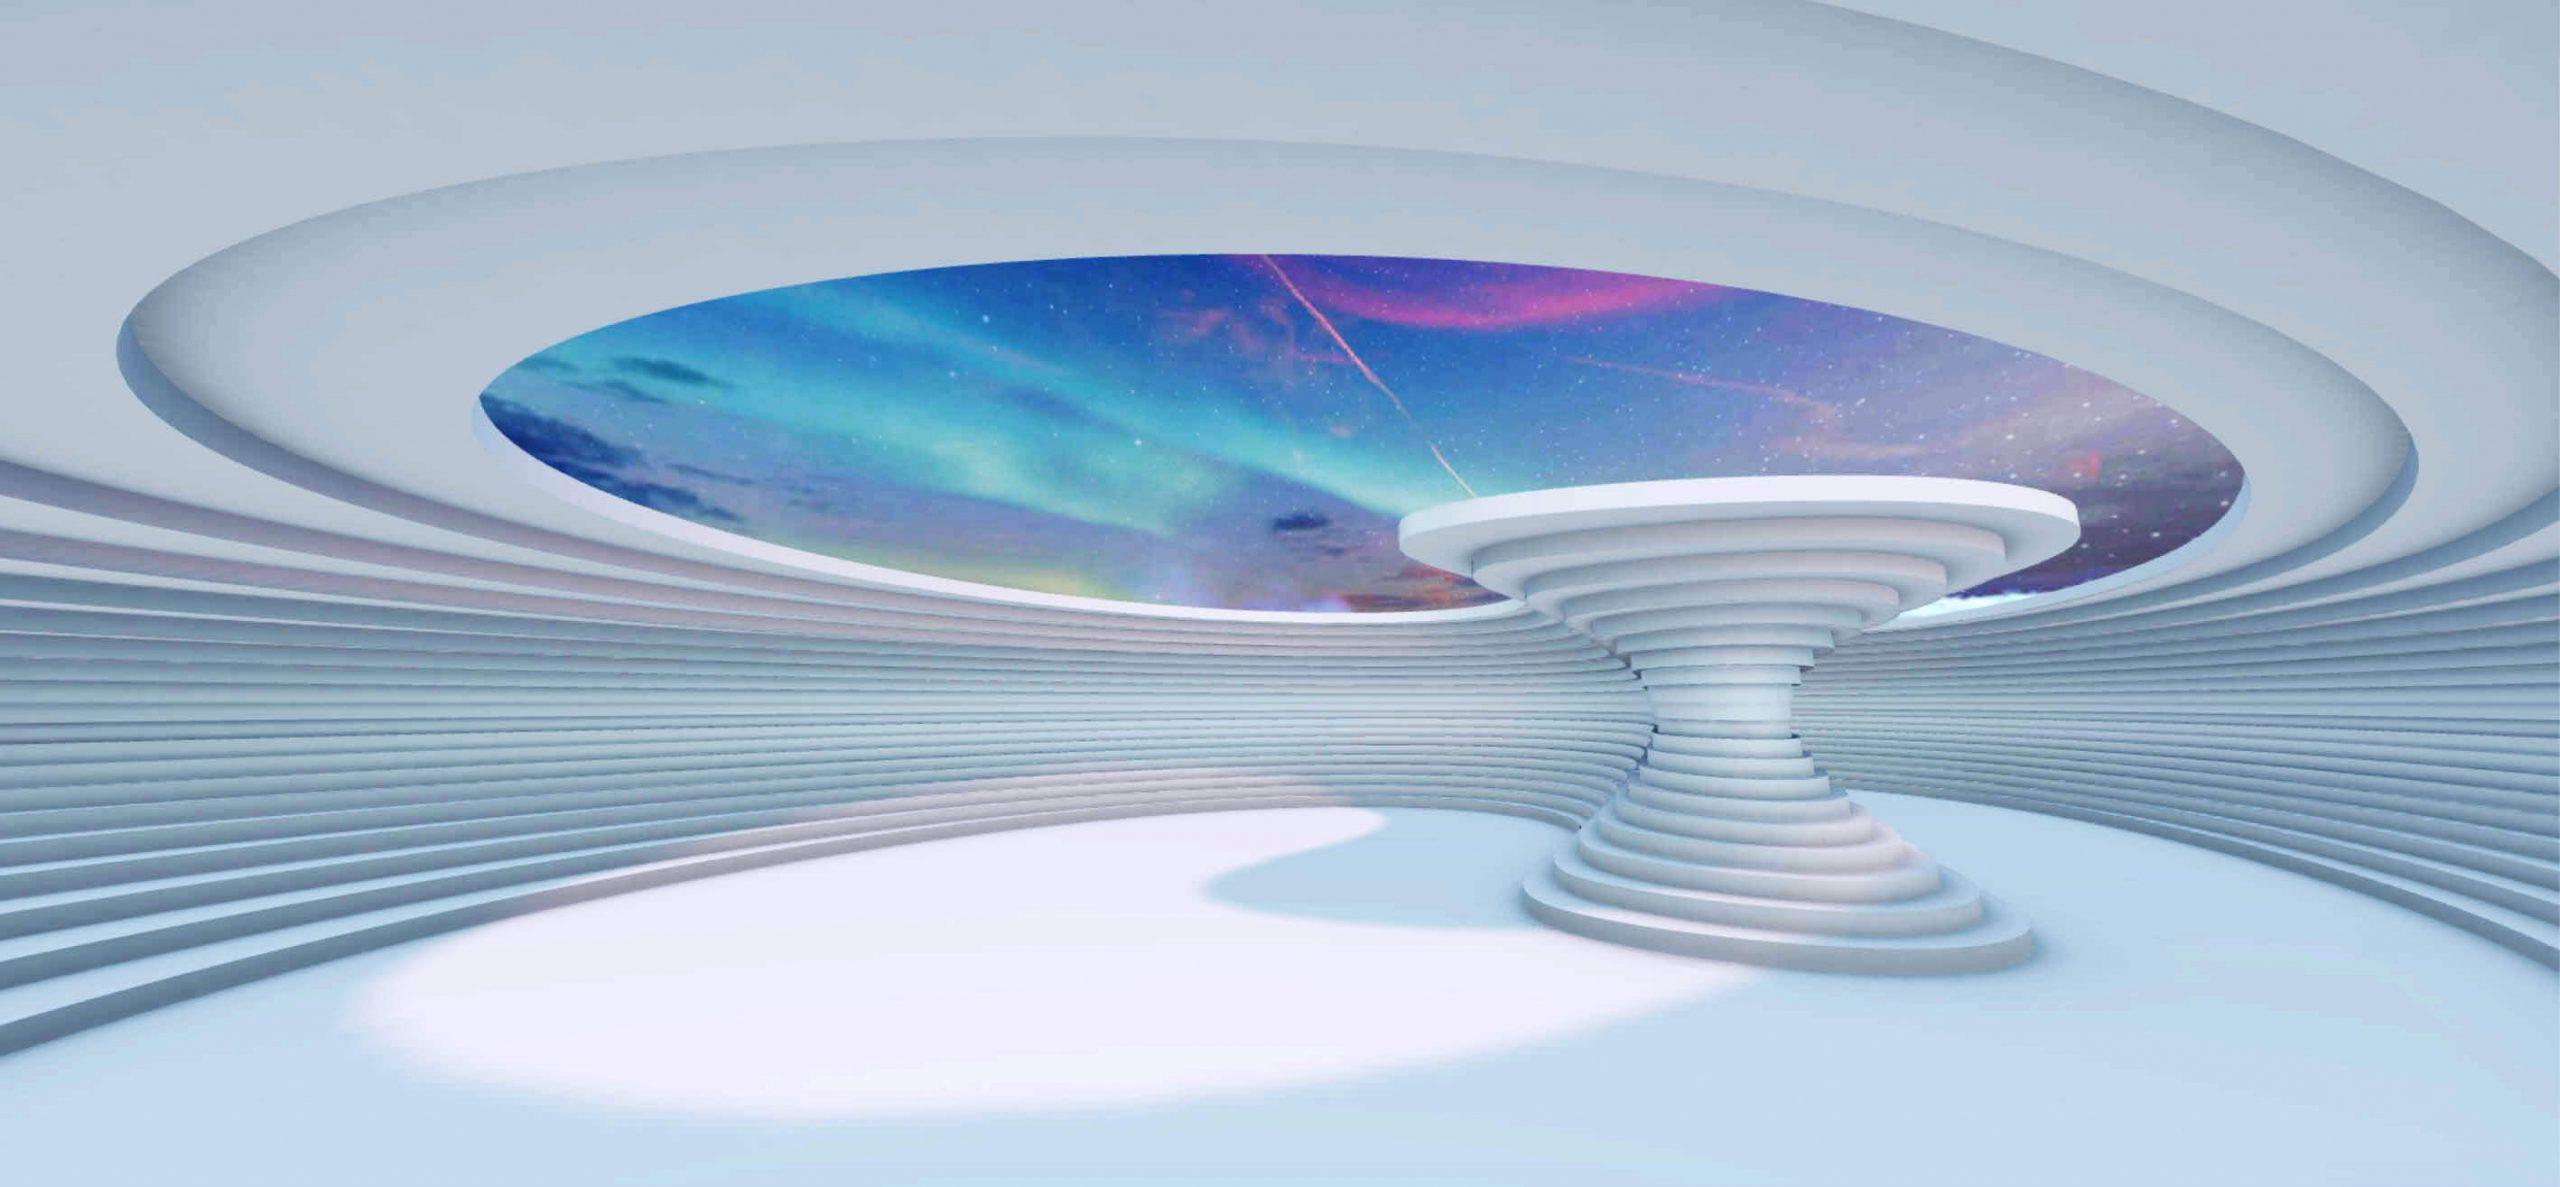 meta1 created by Metaxu.Studio for Agora Digital Art